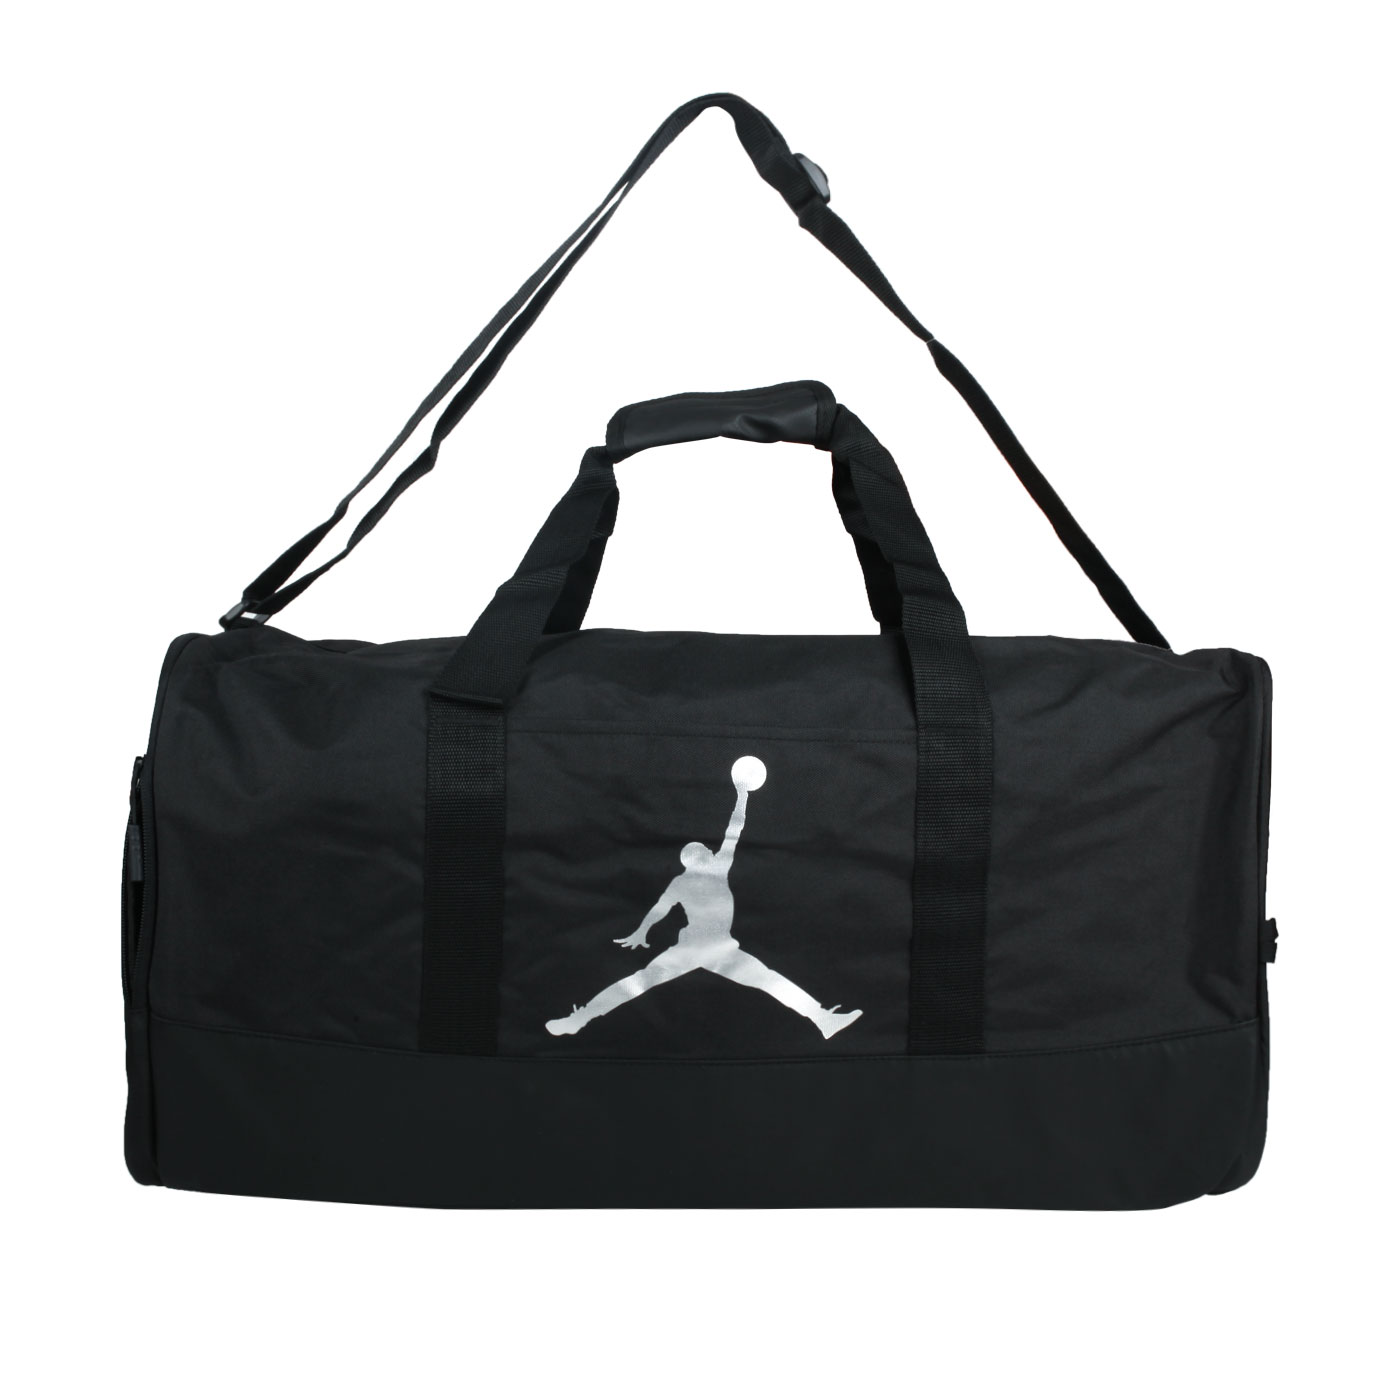 NIKE JORDAN JTRAINER 行李袋 JD933034GS-001 - 黑銀